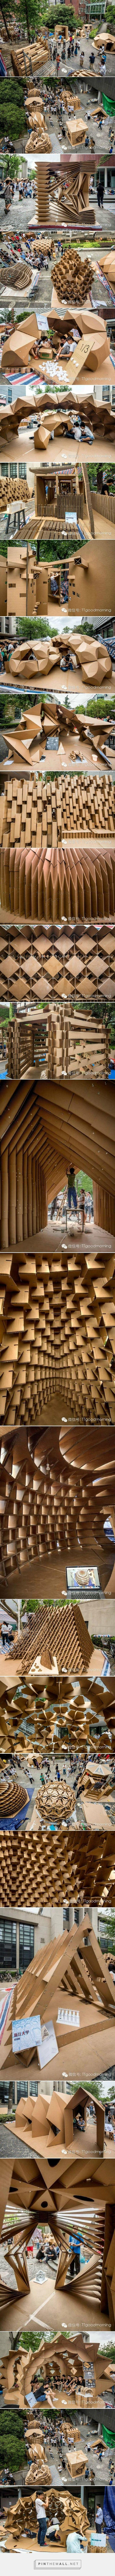 Amazing Cardboard House Exhibition - created on 2016-08-07 14:23:44